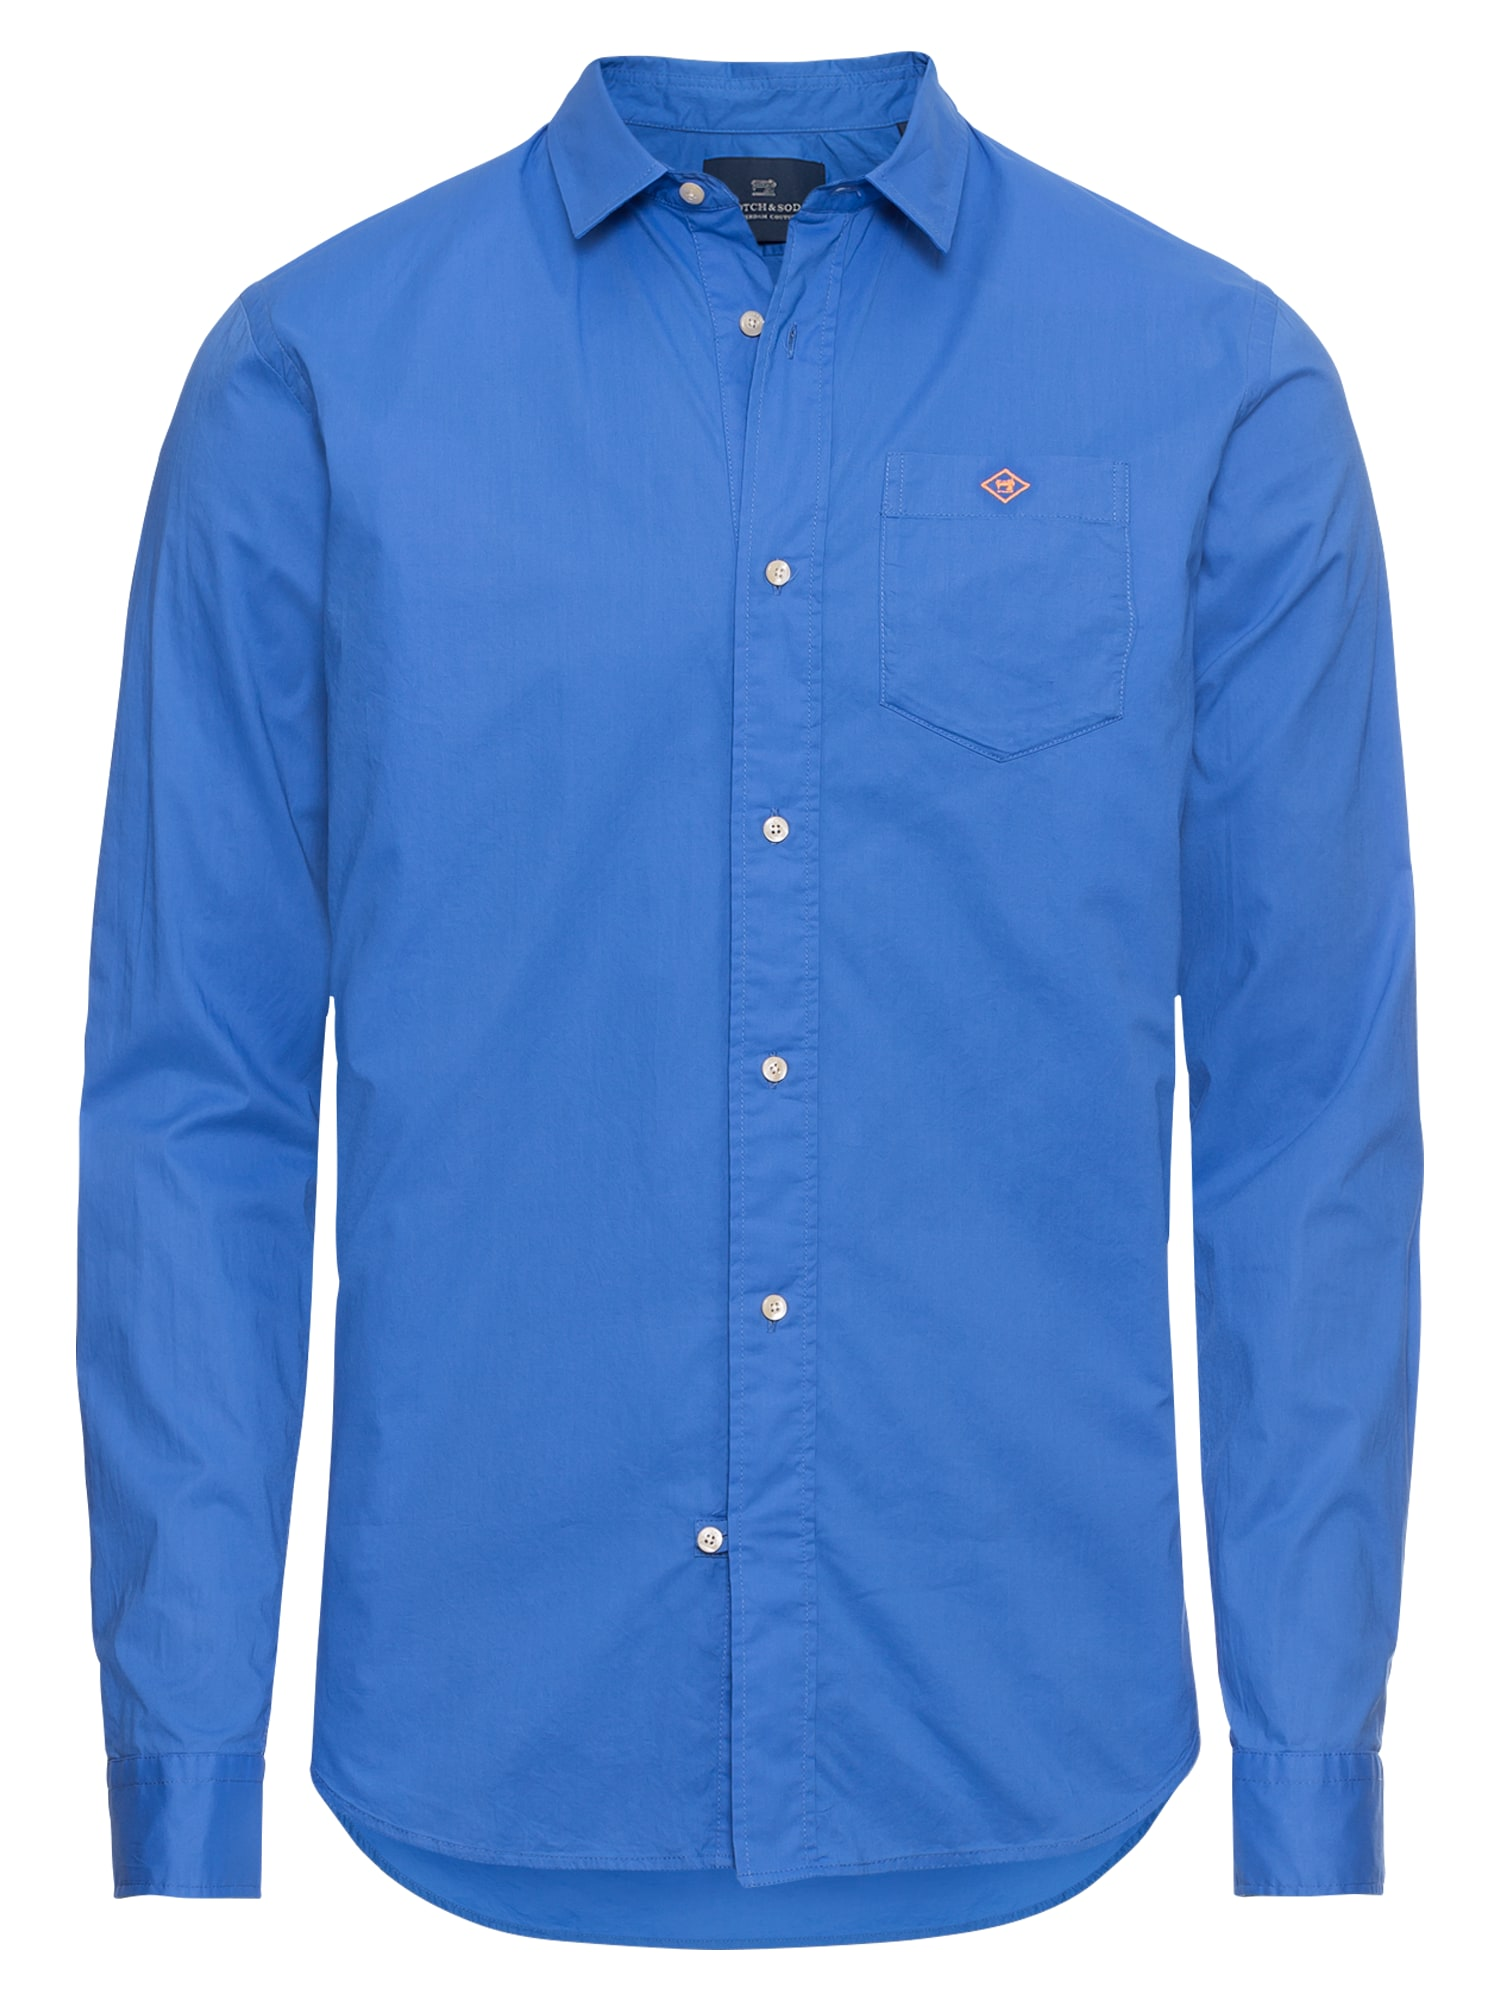 SCOTCH  and  SODA Heren Overhemd High summer voile shirt royal blue koningsblauw